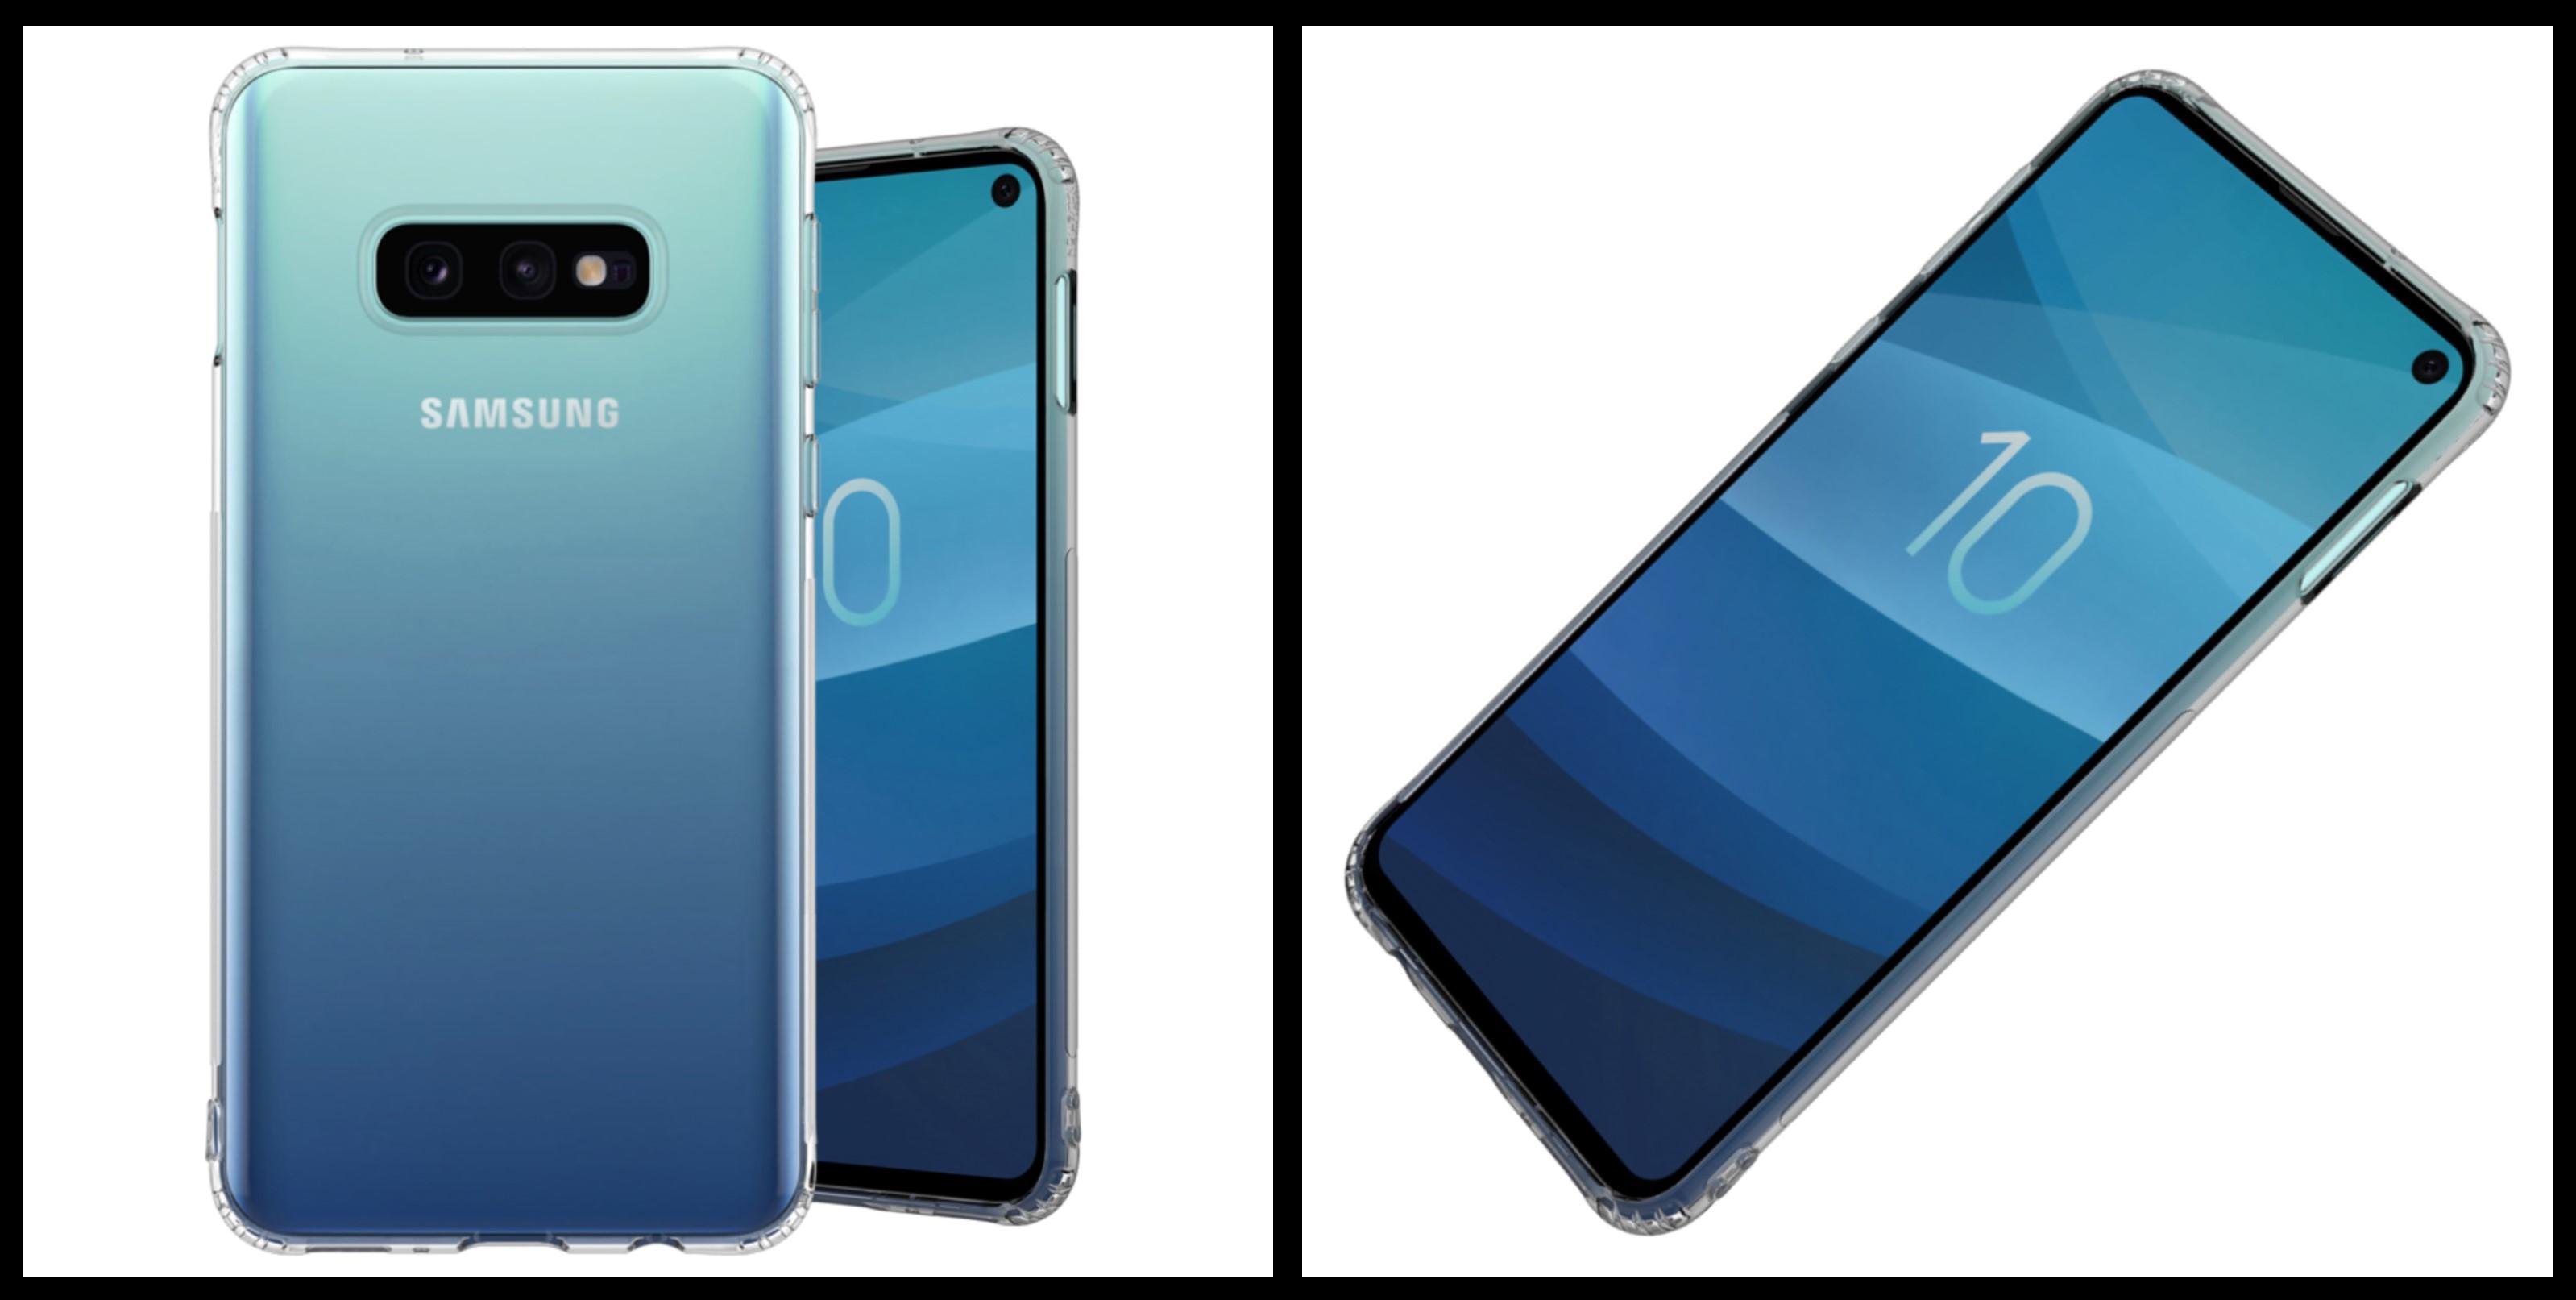 noziroh slim samsung galaxy s10e cover case silicone gel tpu design transparent